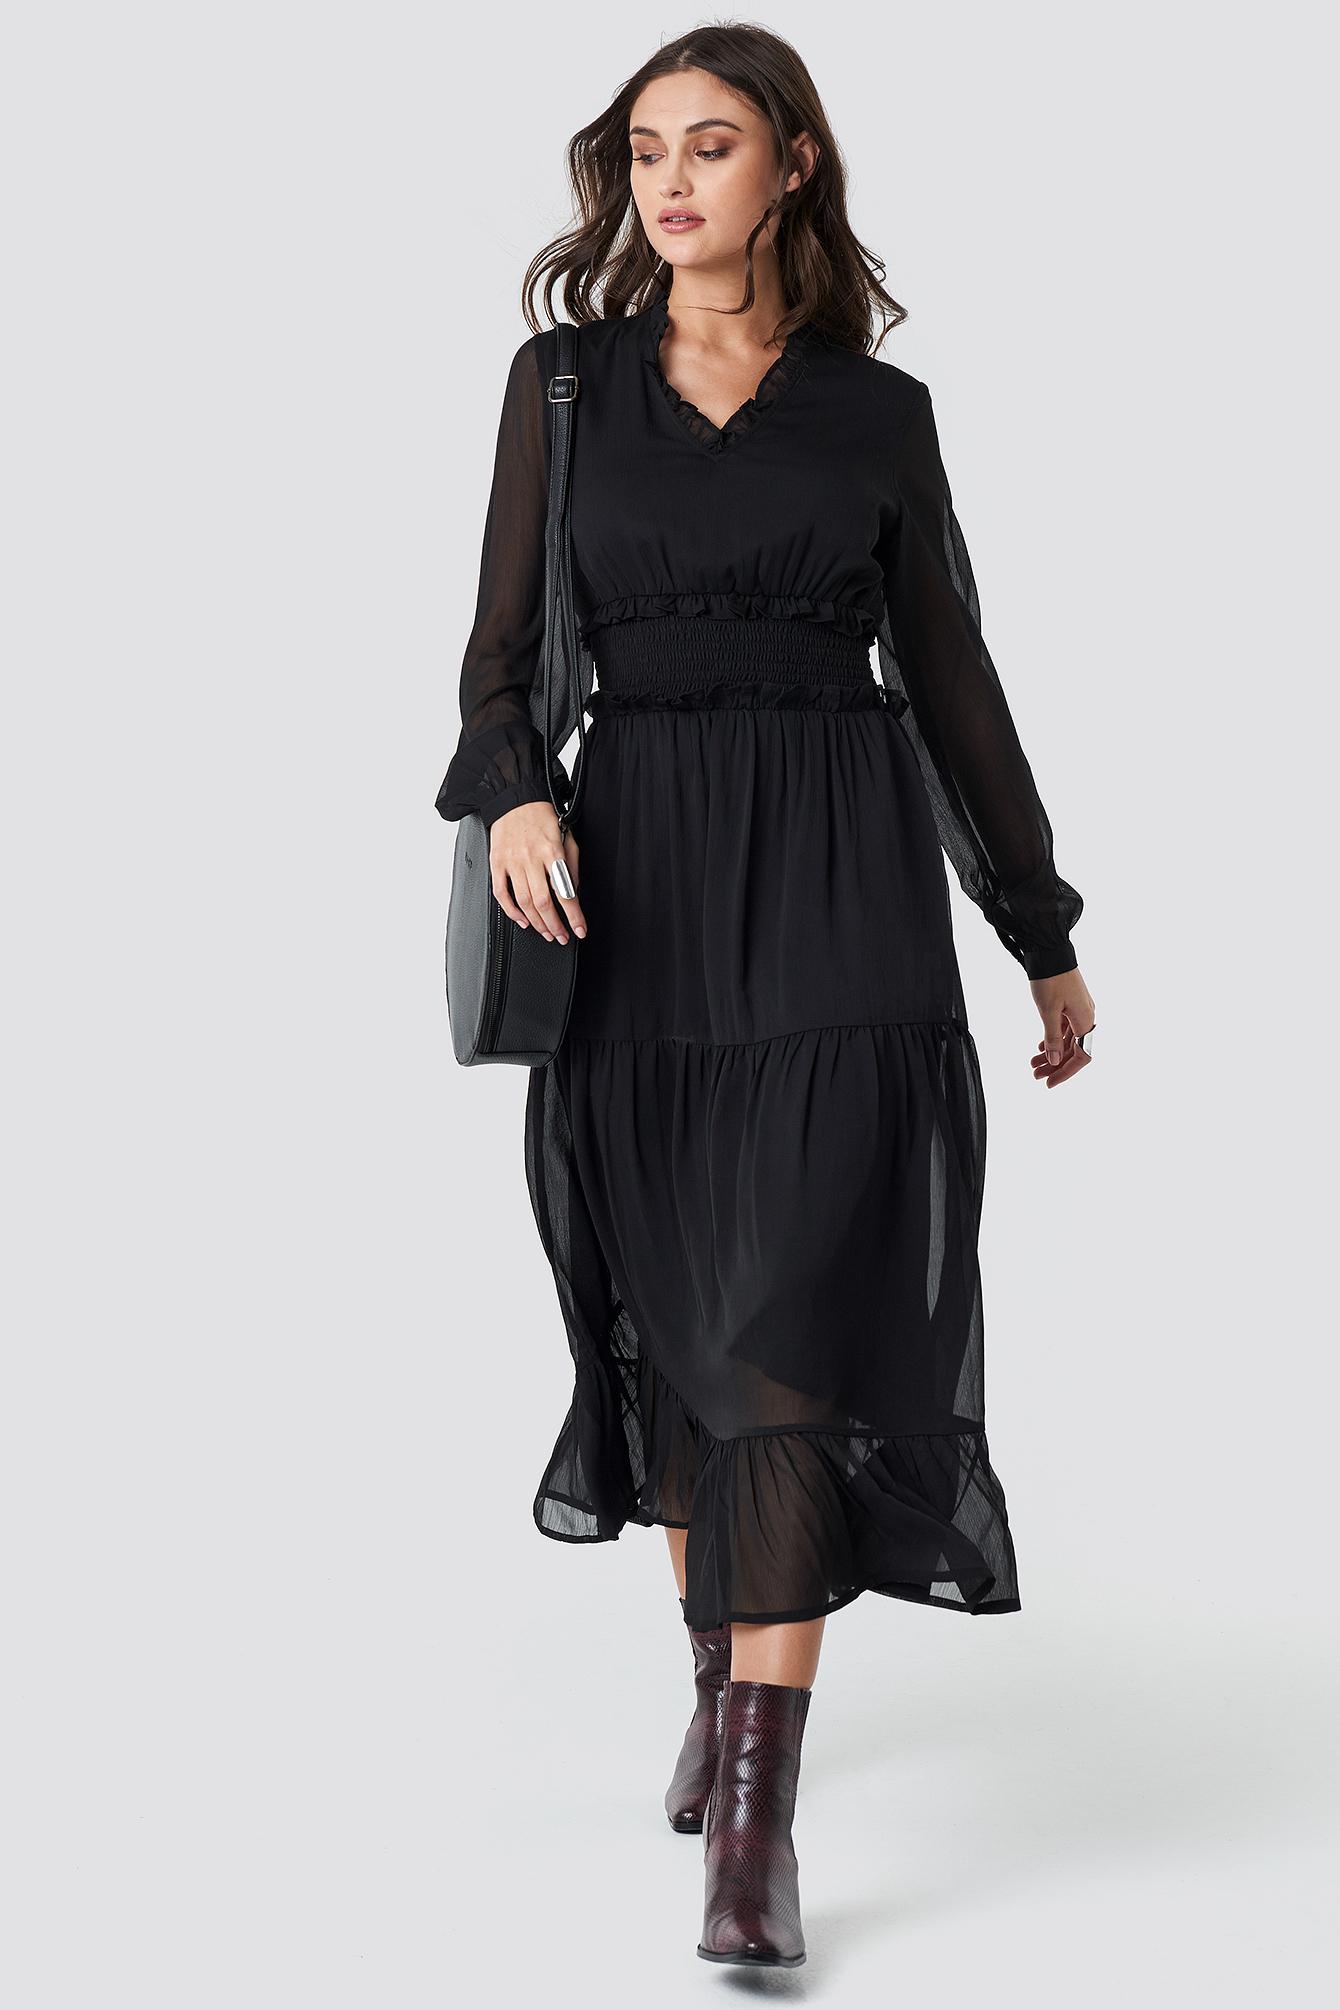 cbcf53e41f3c Ruffle Details Flowy Midi Dress Black